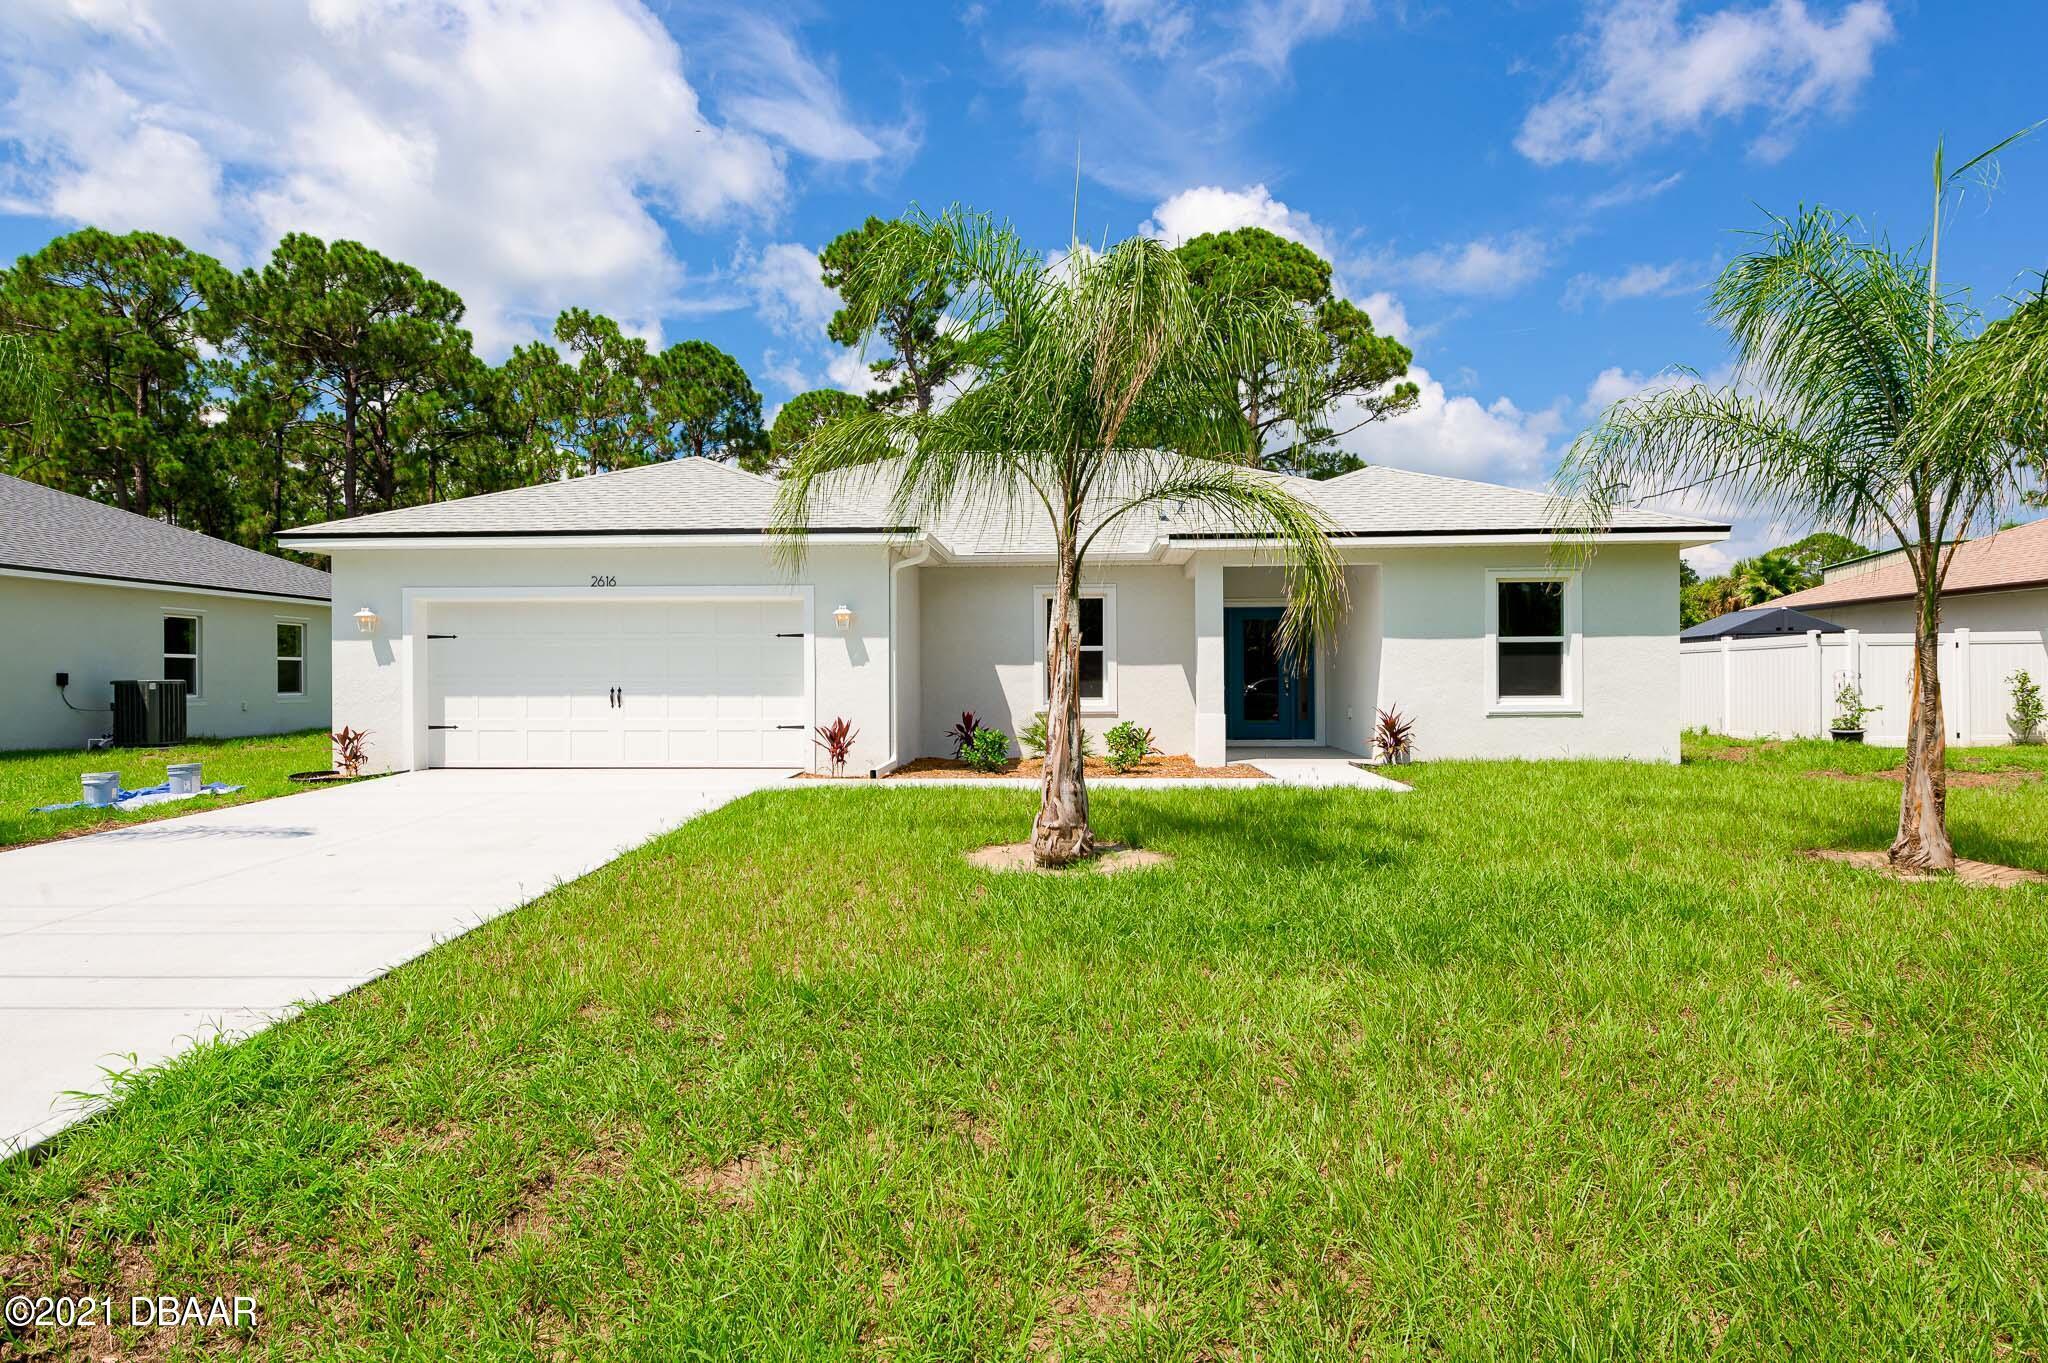 Photo of 2616 Fern Palm Drive, Edgewater, FL 32141